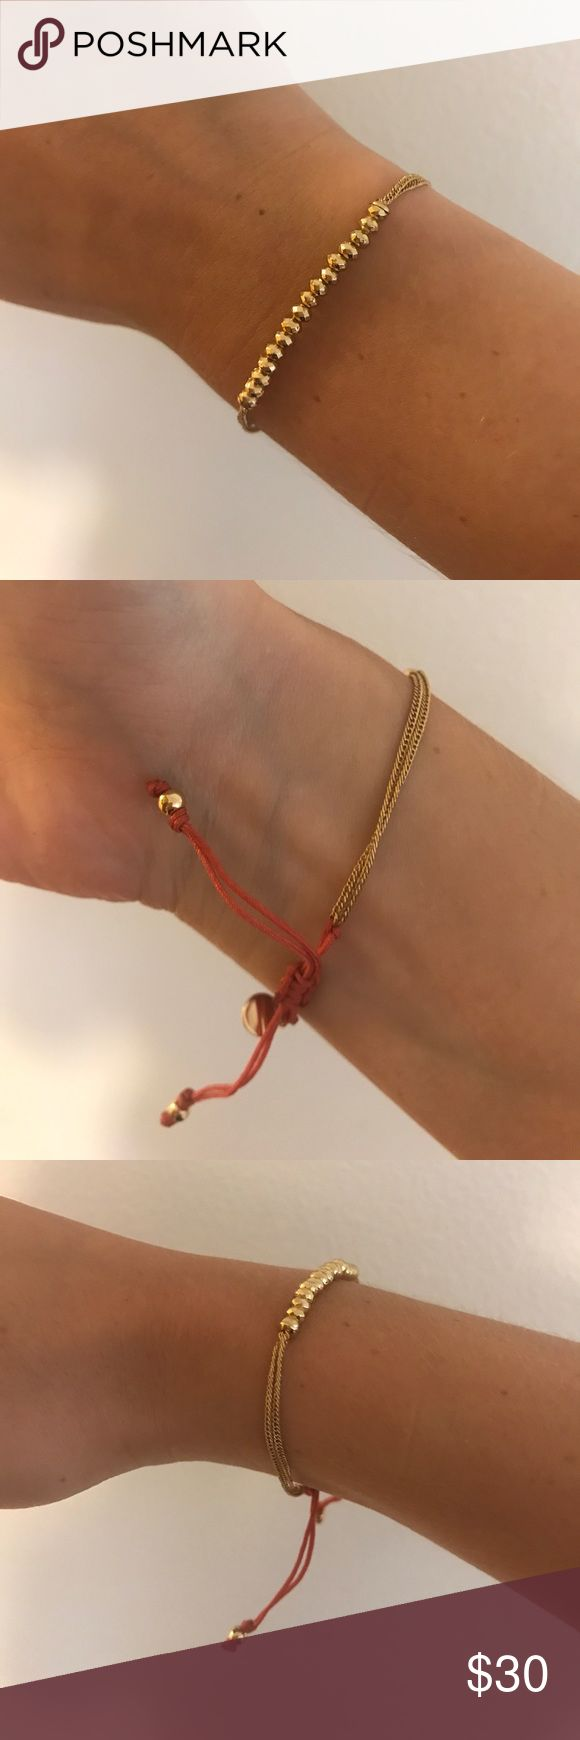 Stella and dot bracelet Stella and dot bracelet Stella & Dot Jewelry Bracelets